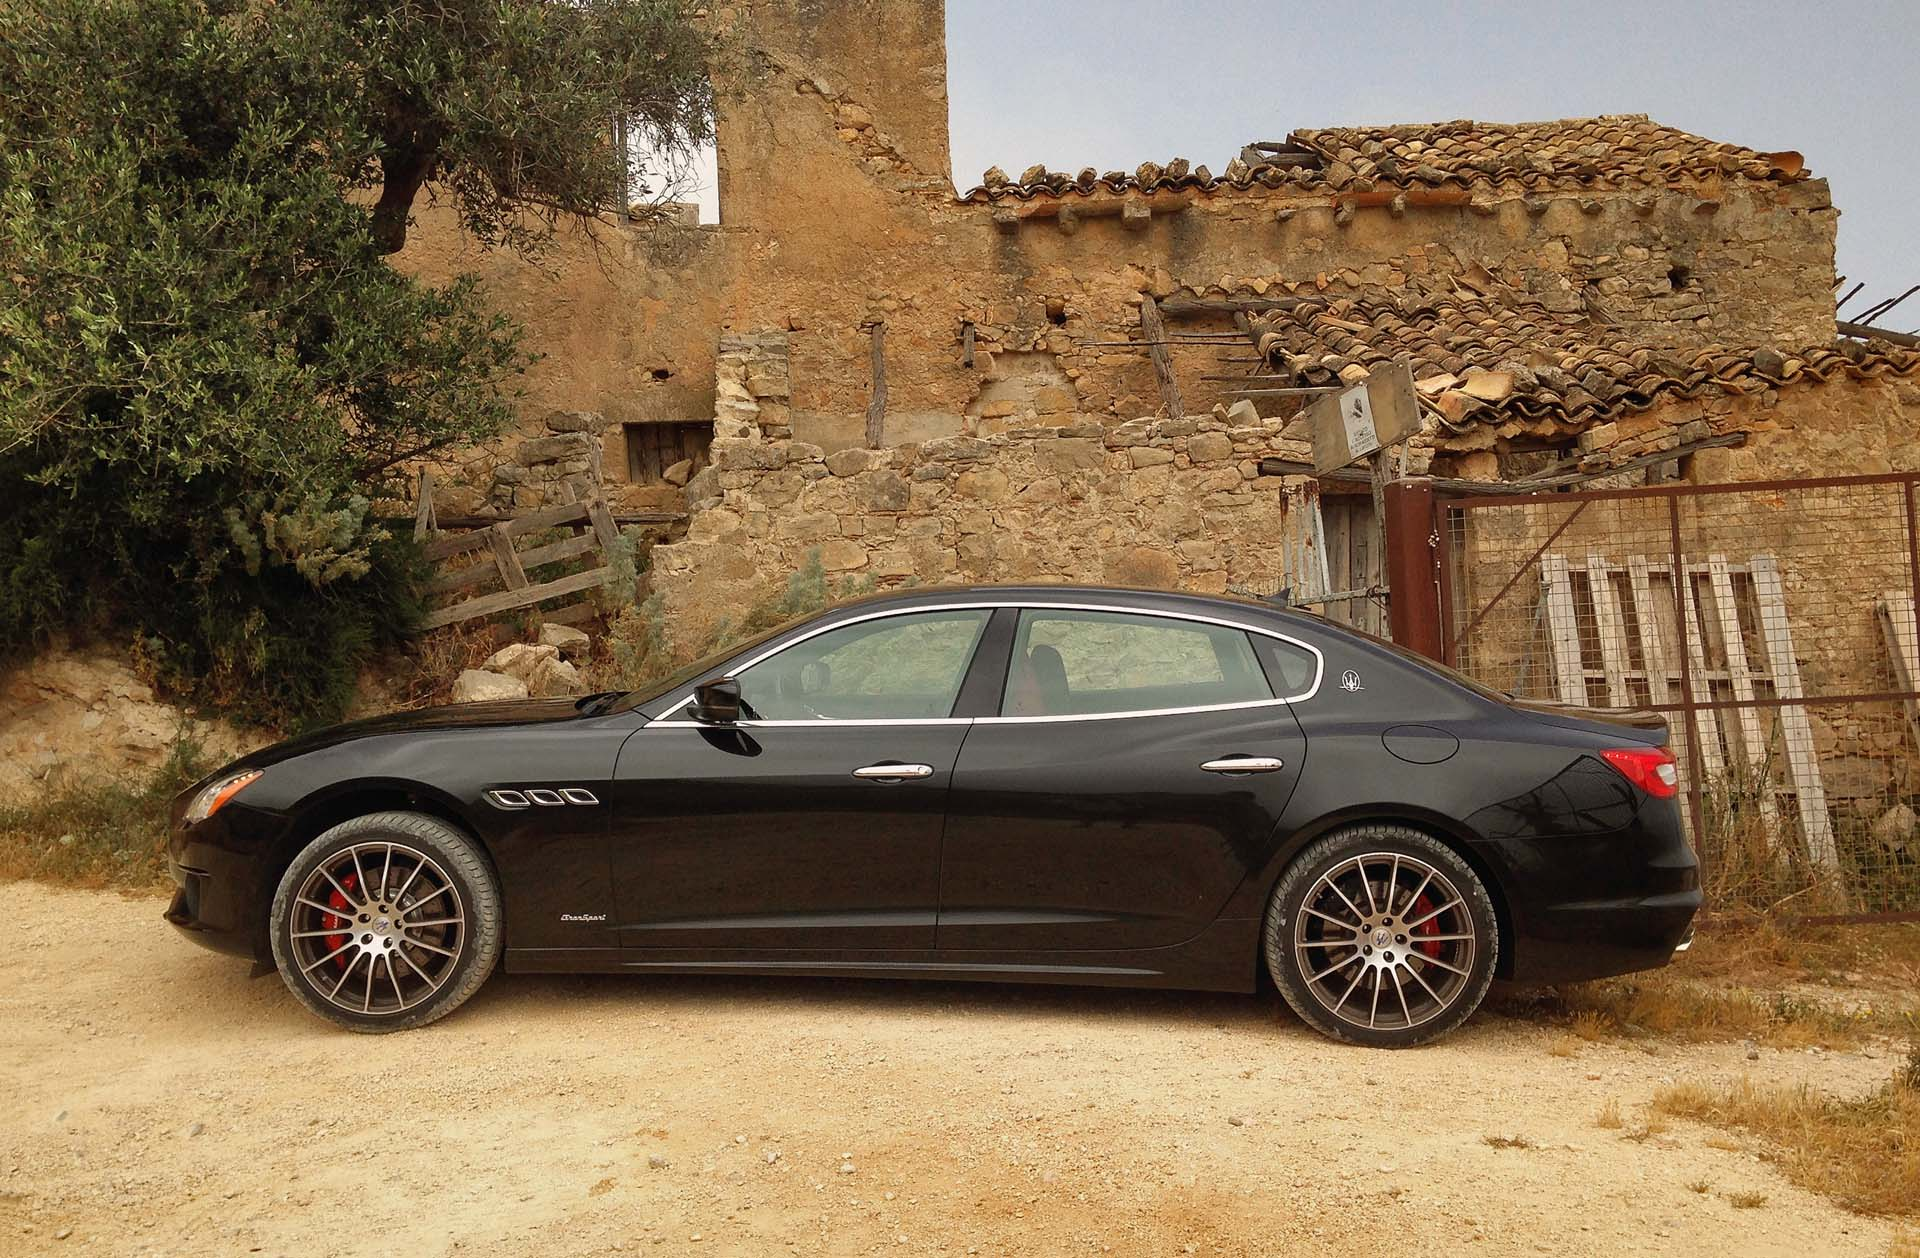 Permalink to 2017 Maserati Quattroporte S Q4